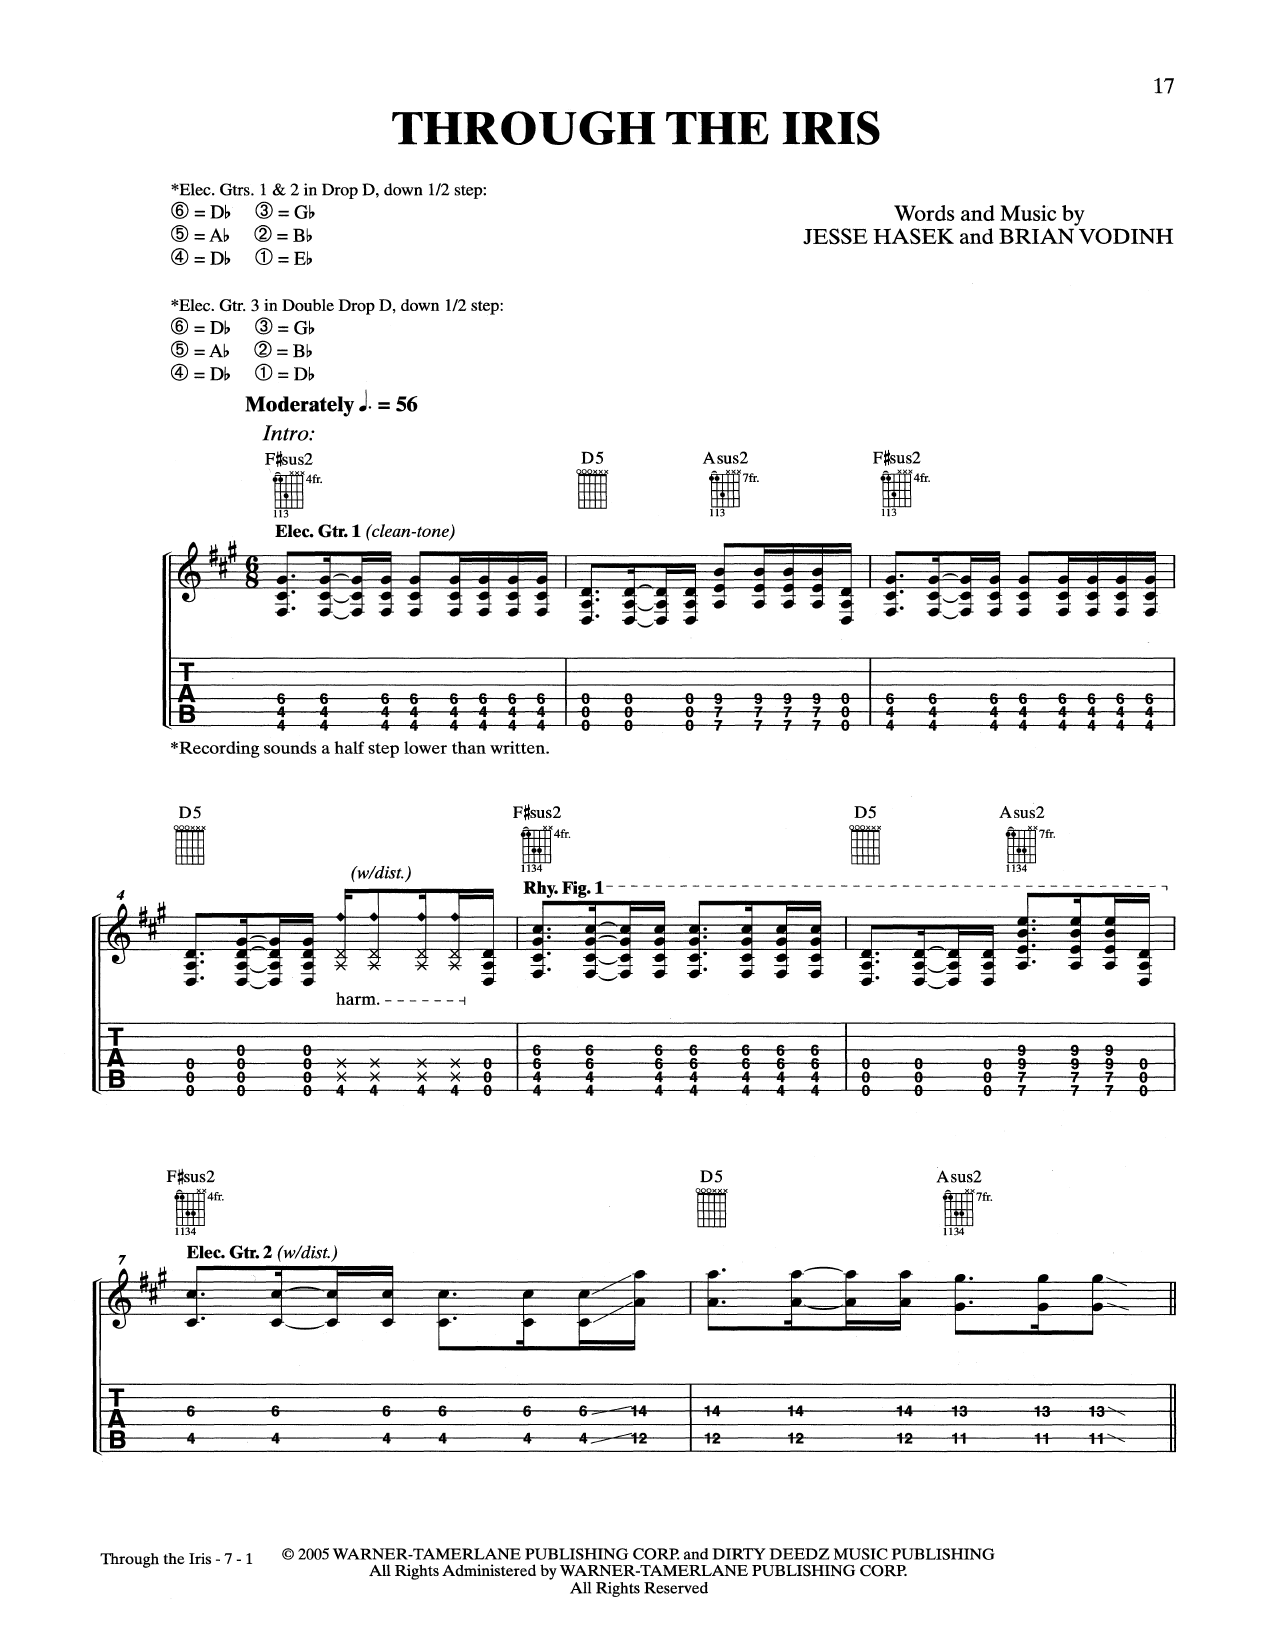 Through The Iris Sheet Music